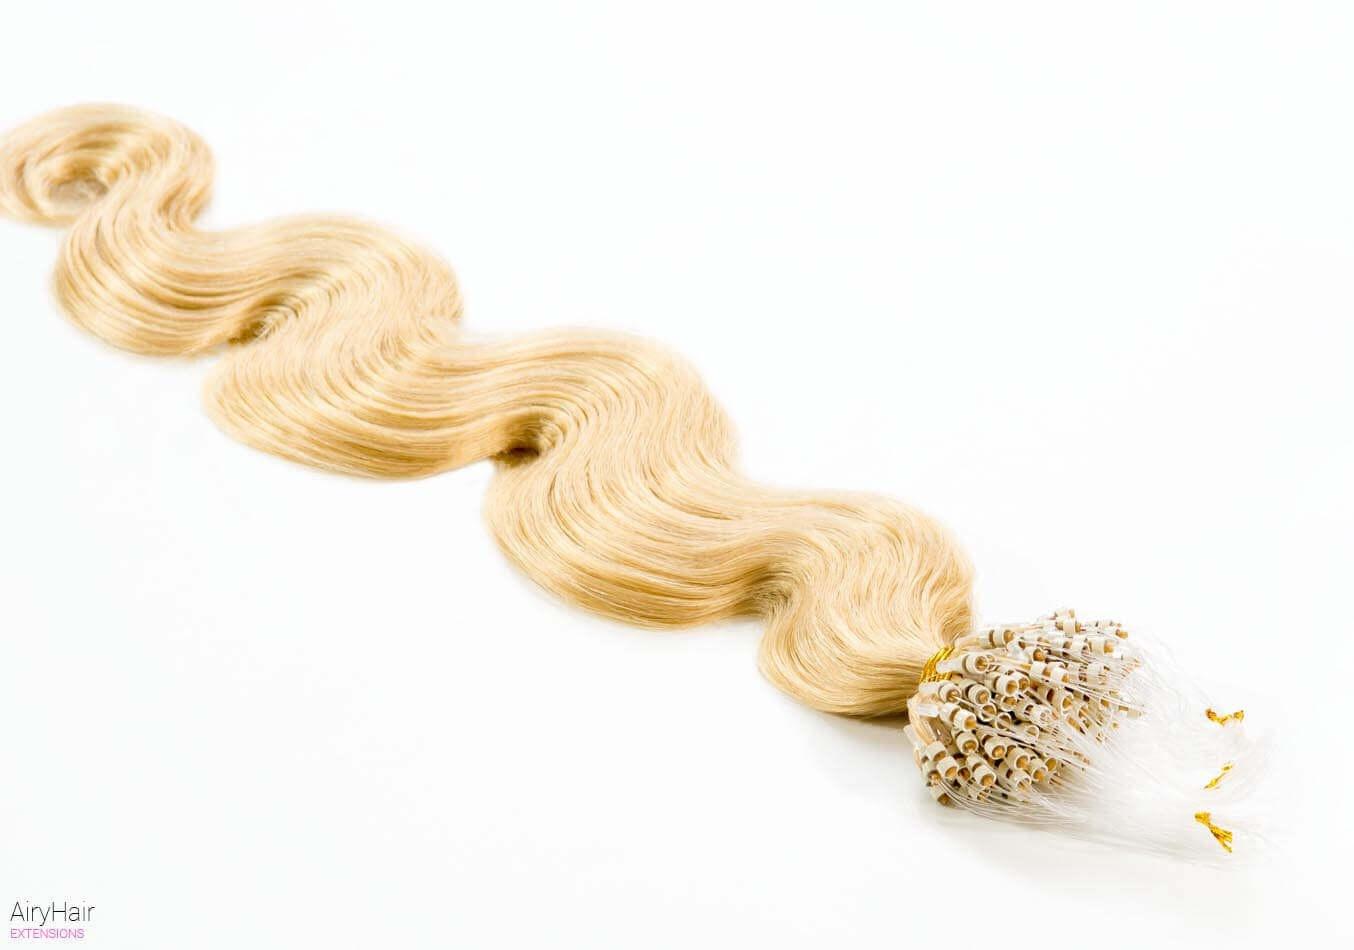 Buy Curly Micro Bead Hair Extensions Airyhair